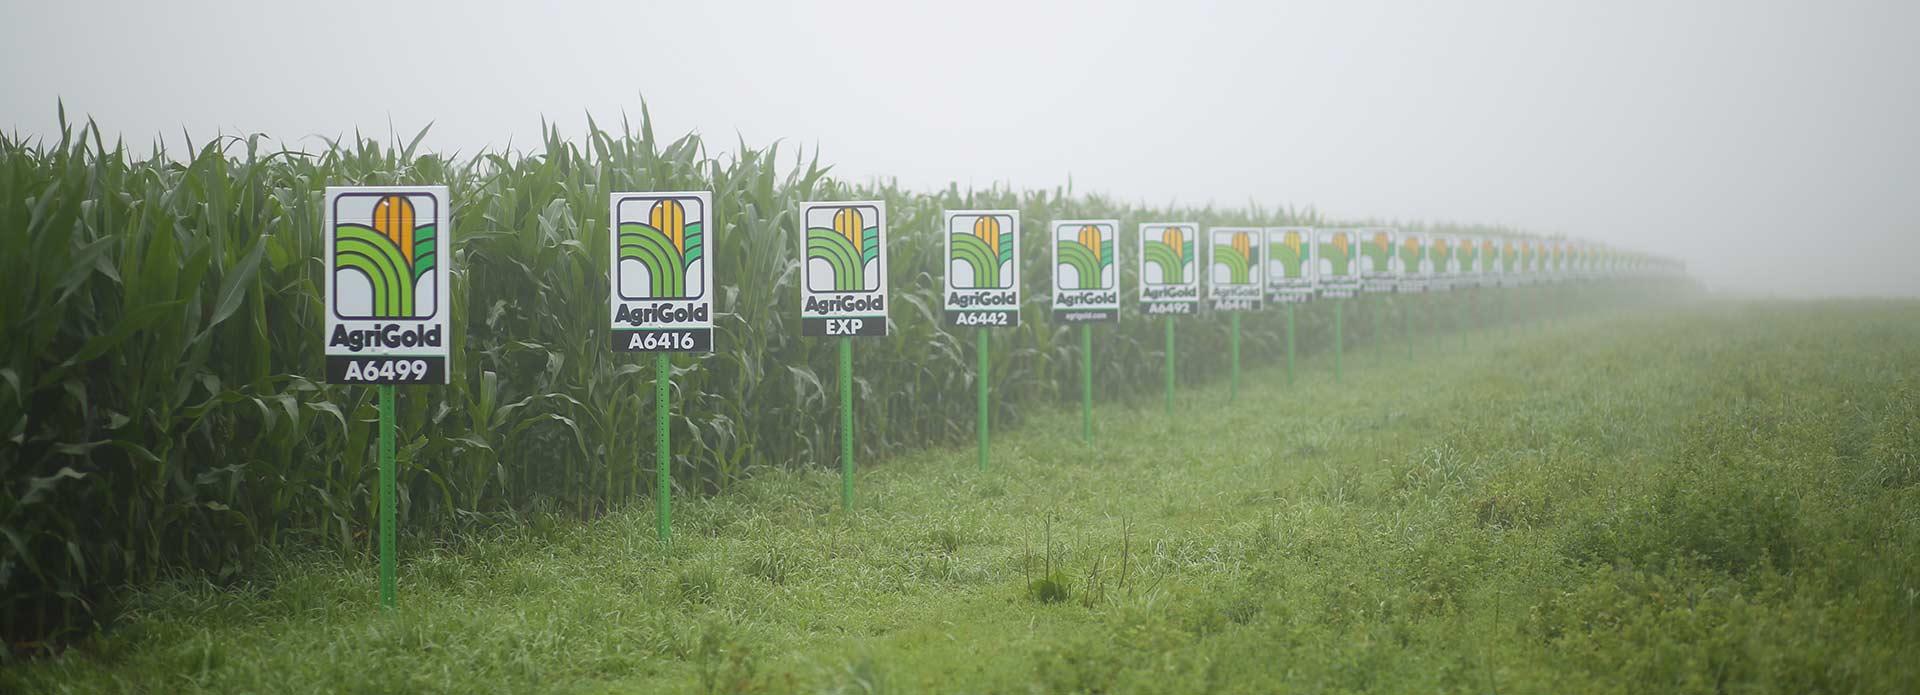 Eldon-C-Stutsman-Inc-Agronomy-AgriGold-Plot